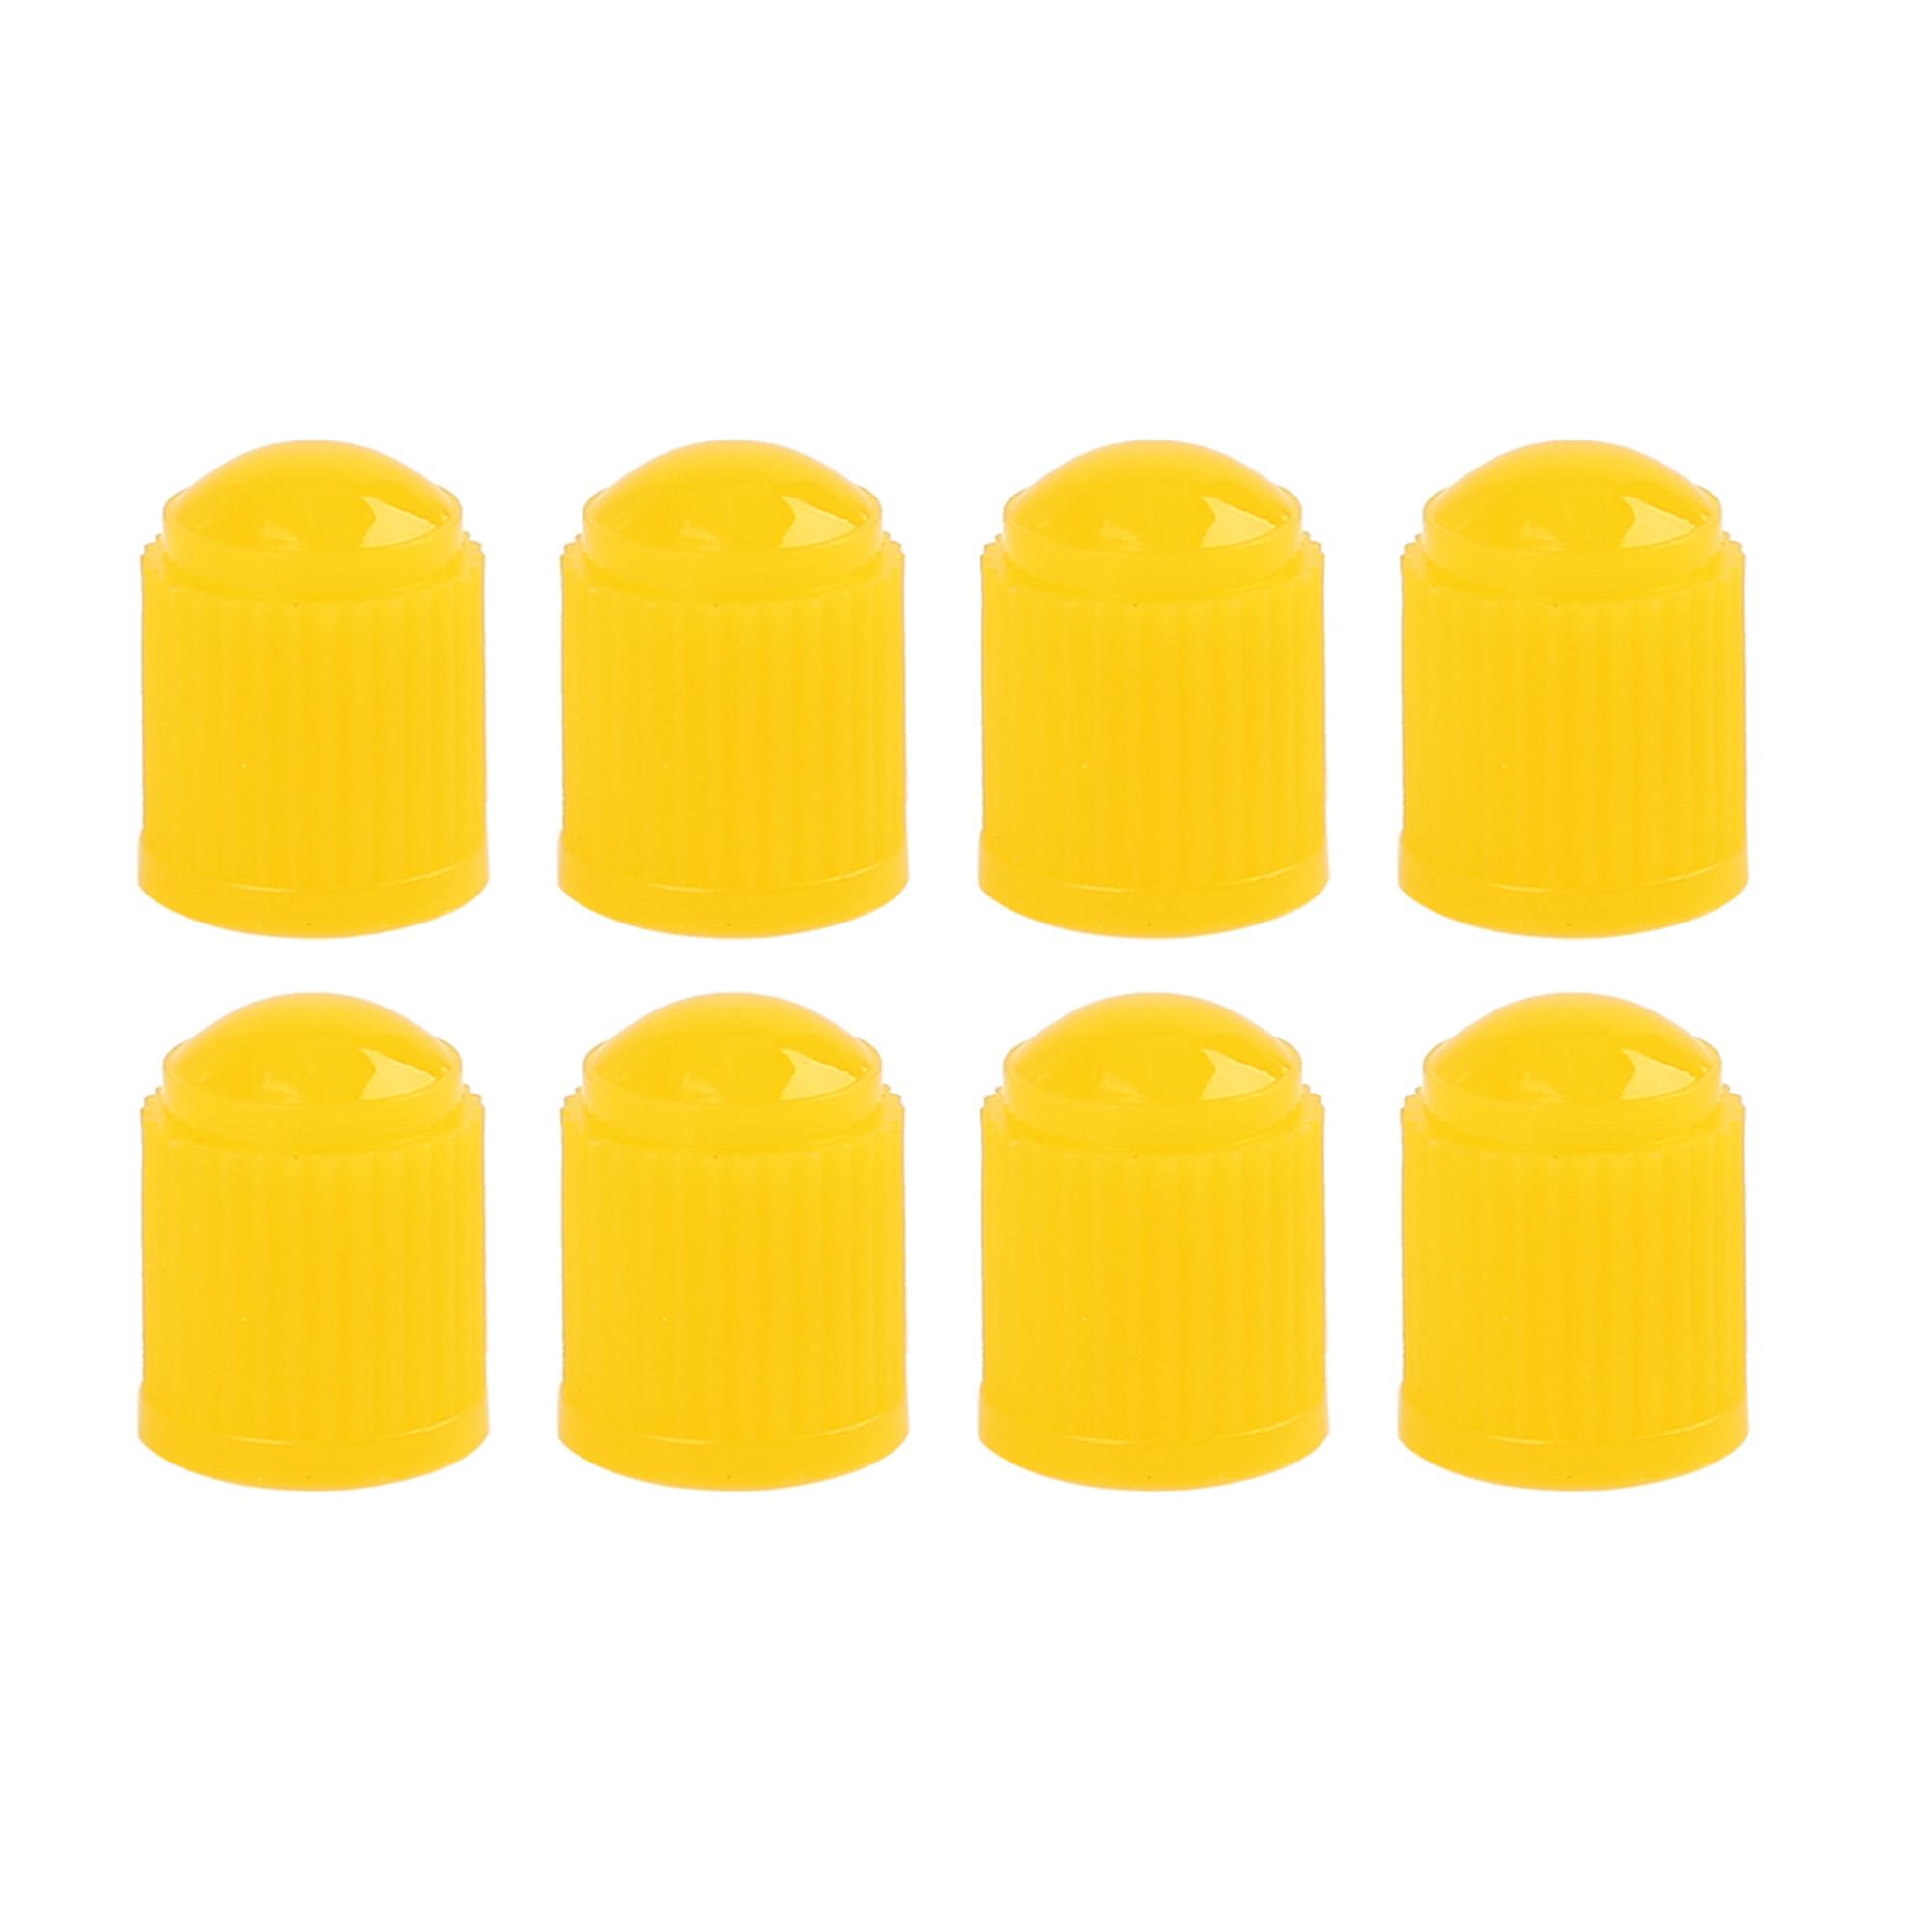 8pcs Yellow Plastic Universal Tire Valve Stem Cap Cover for Motorcycle Bike Car